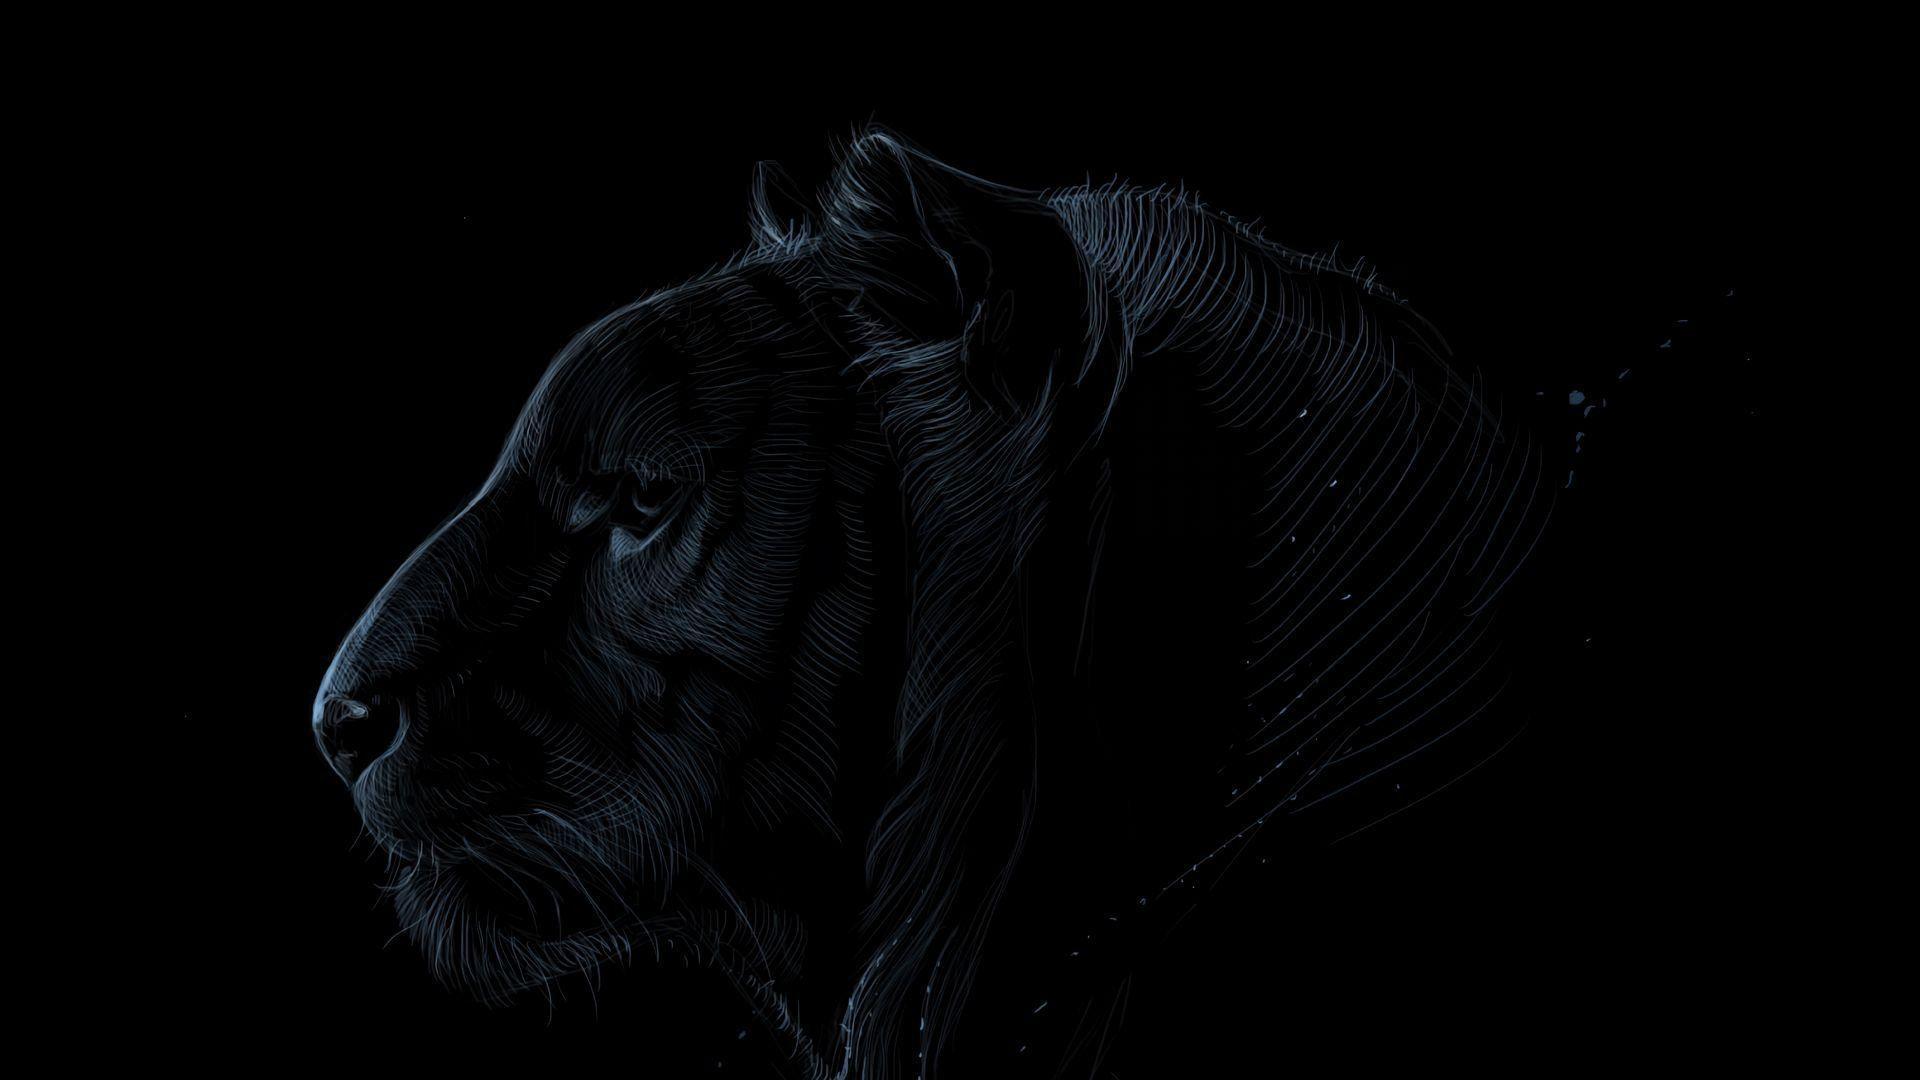 Dark Tiger Wallpapers Top Free Dark Tiger Backgrounds Wallpaperaccess